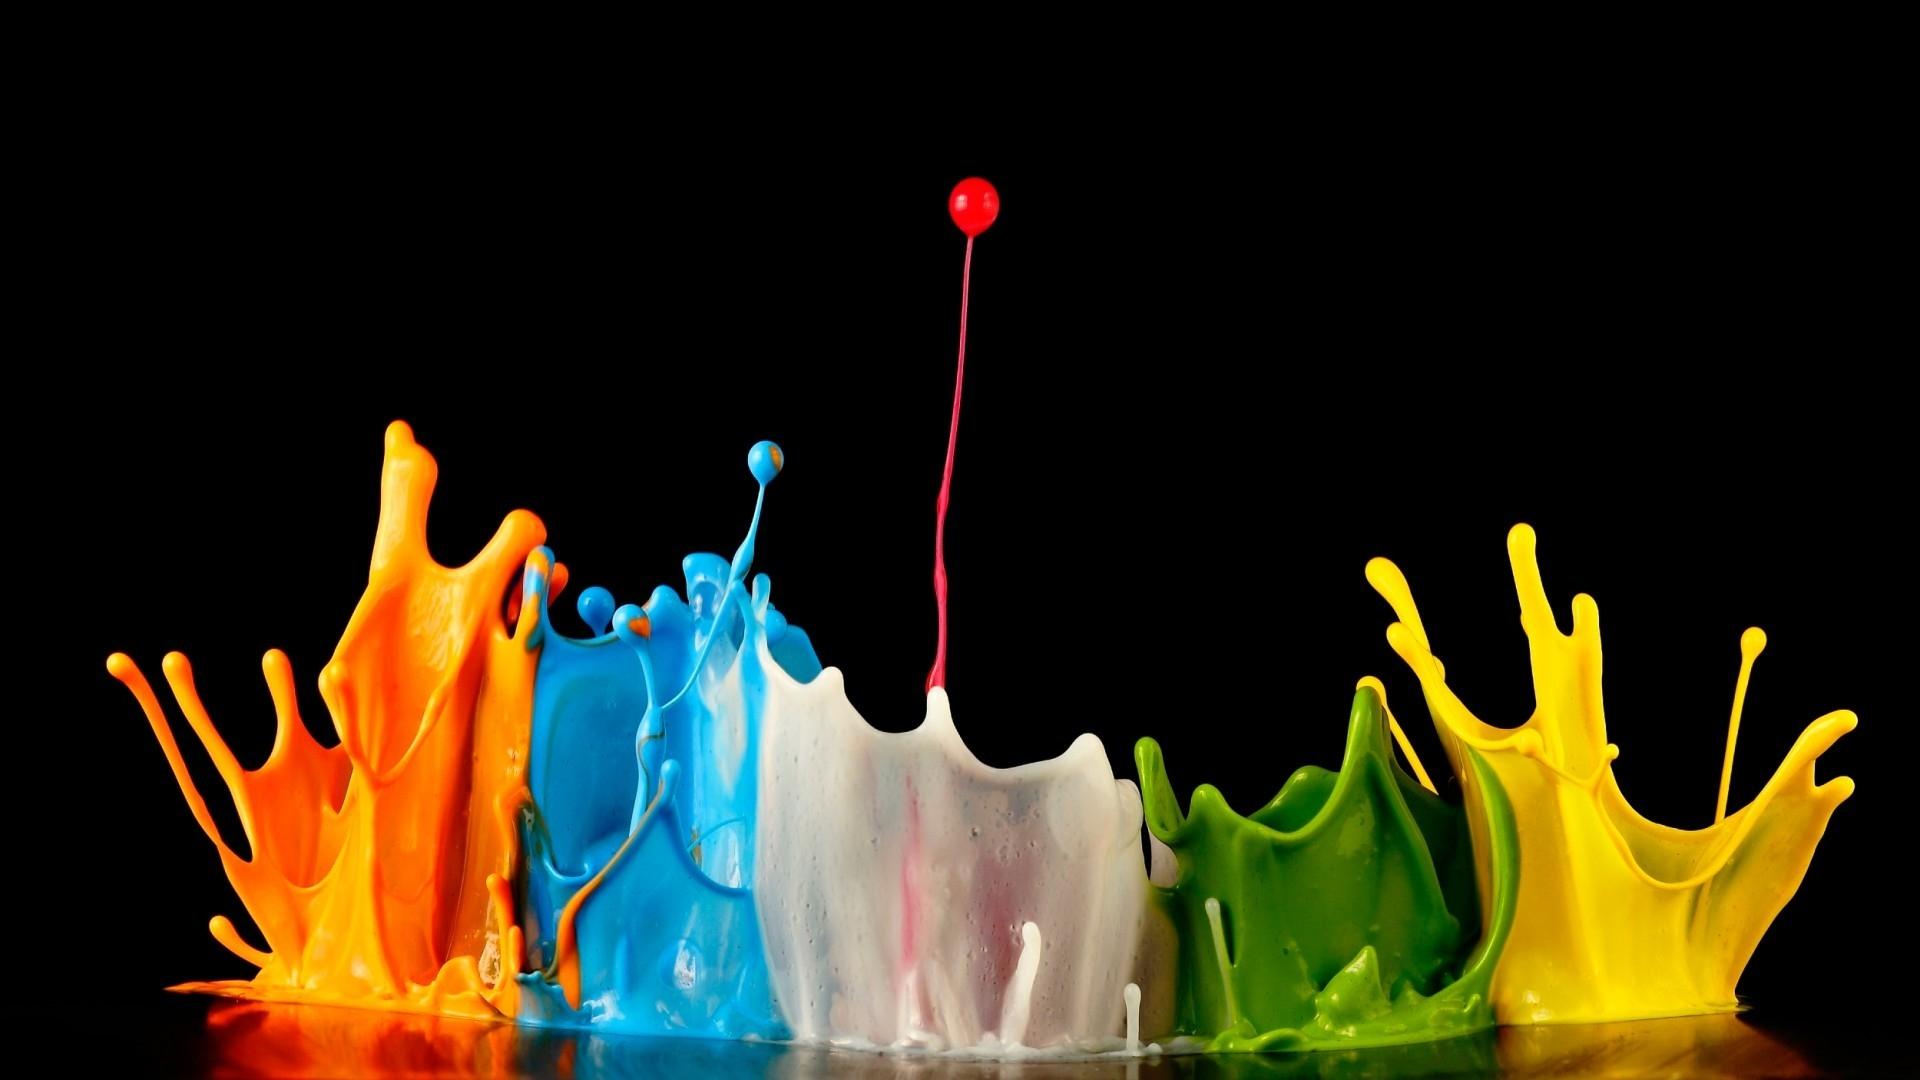 color explosion 1920 x 1080 hdtv 1080p wallpaper